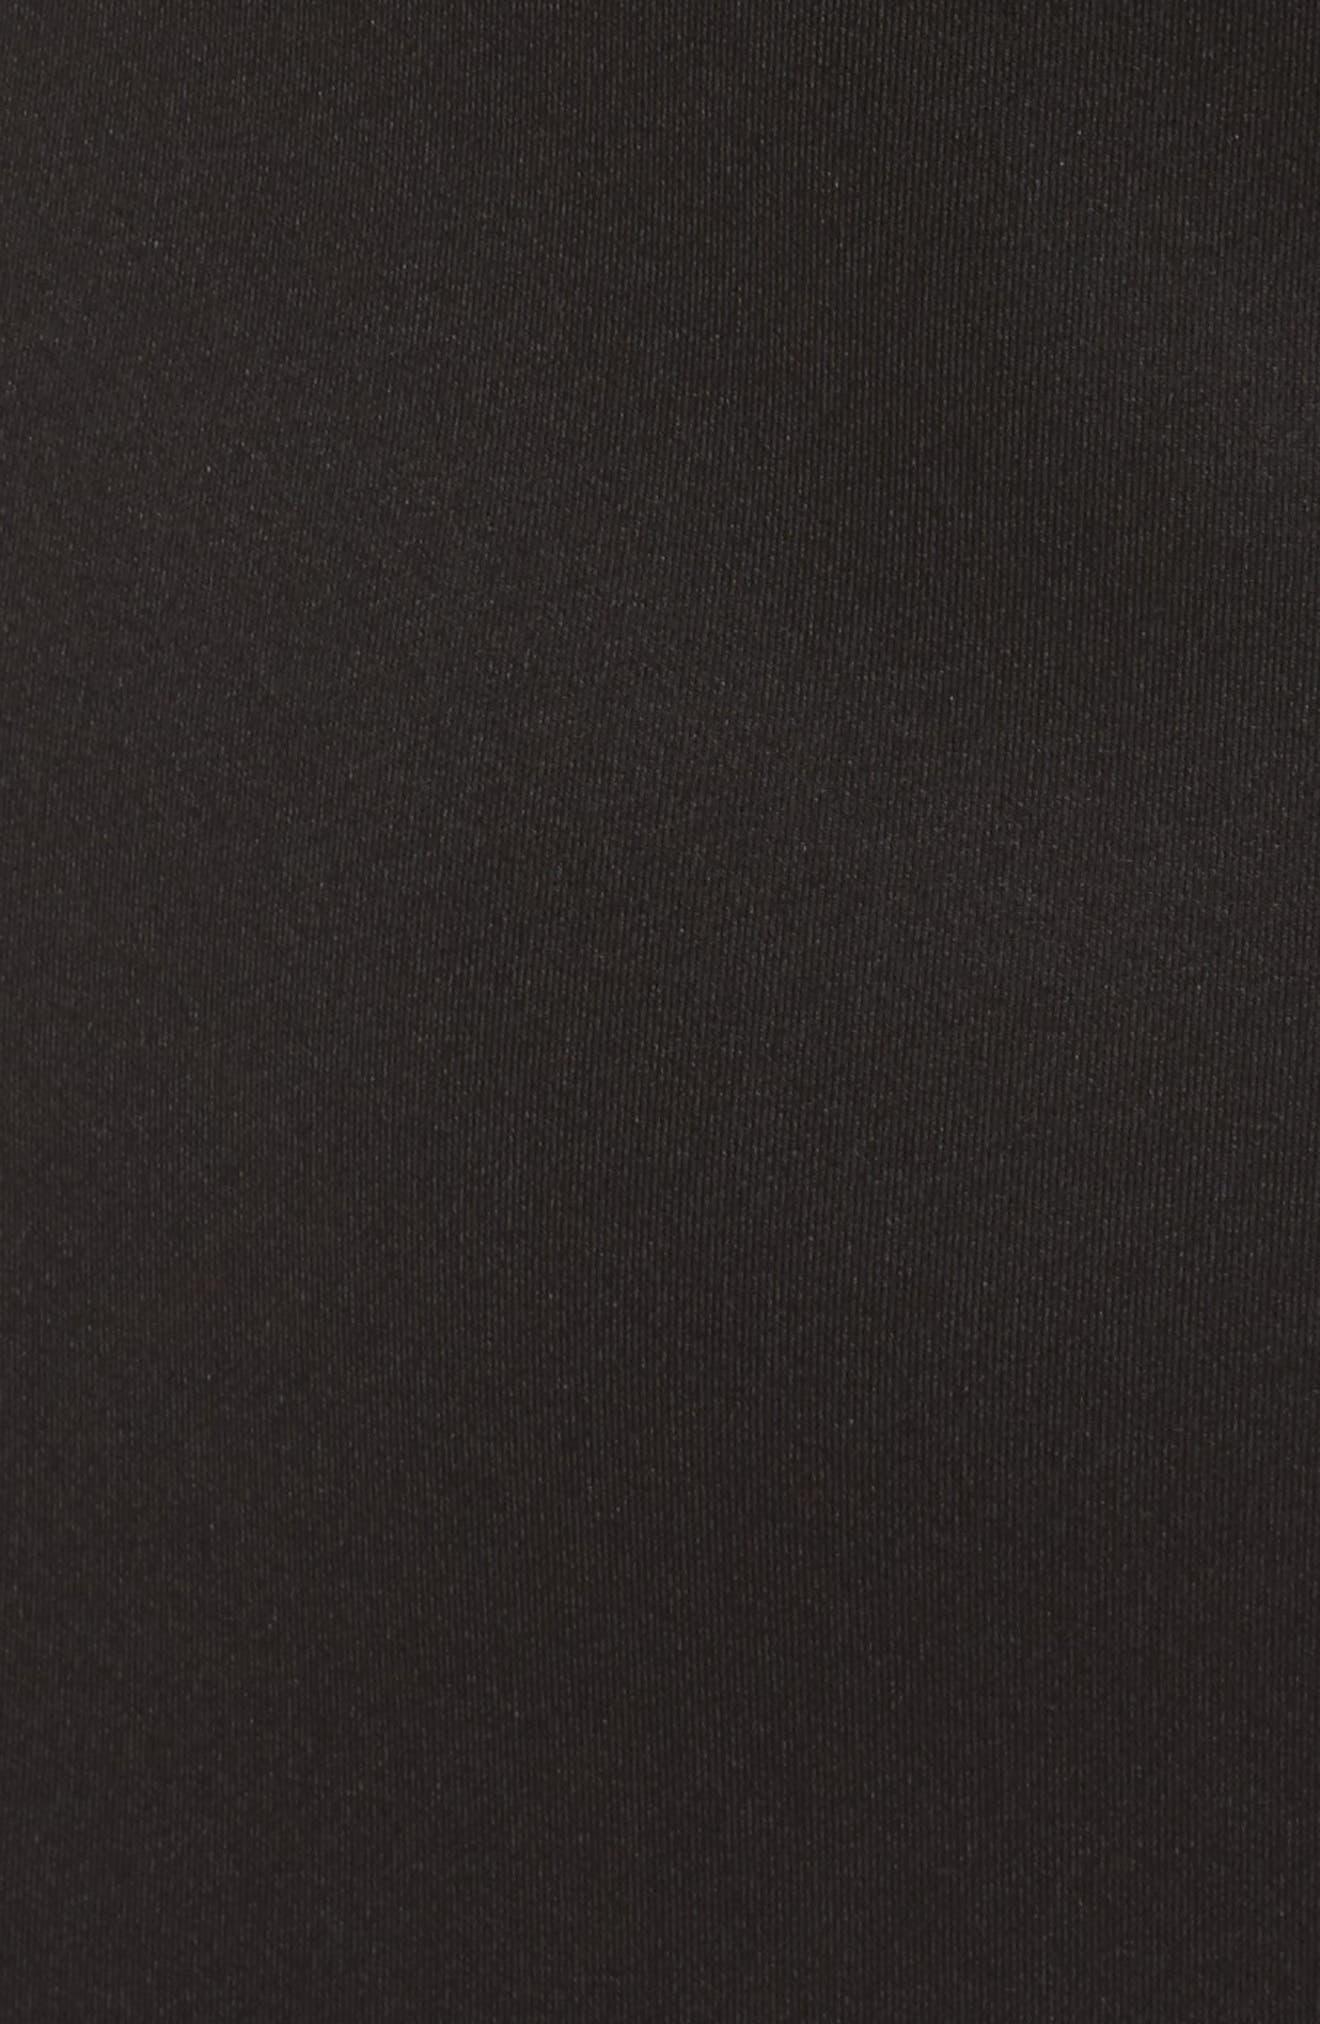 One-Shoulder Asymmetric Dress,                             Alternate thumbnail 5, color,                             Black